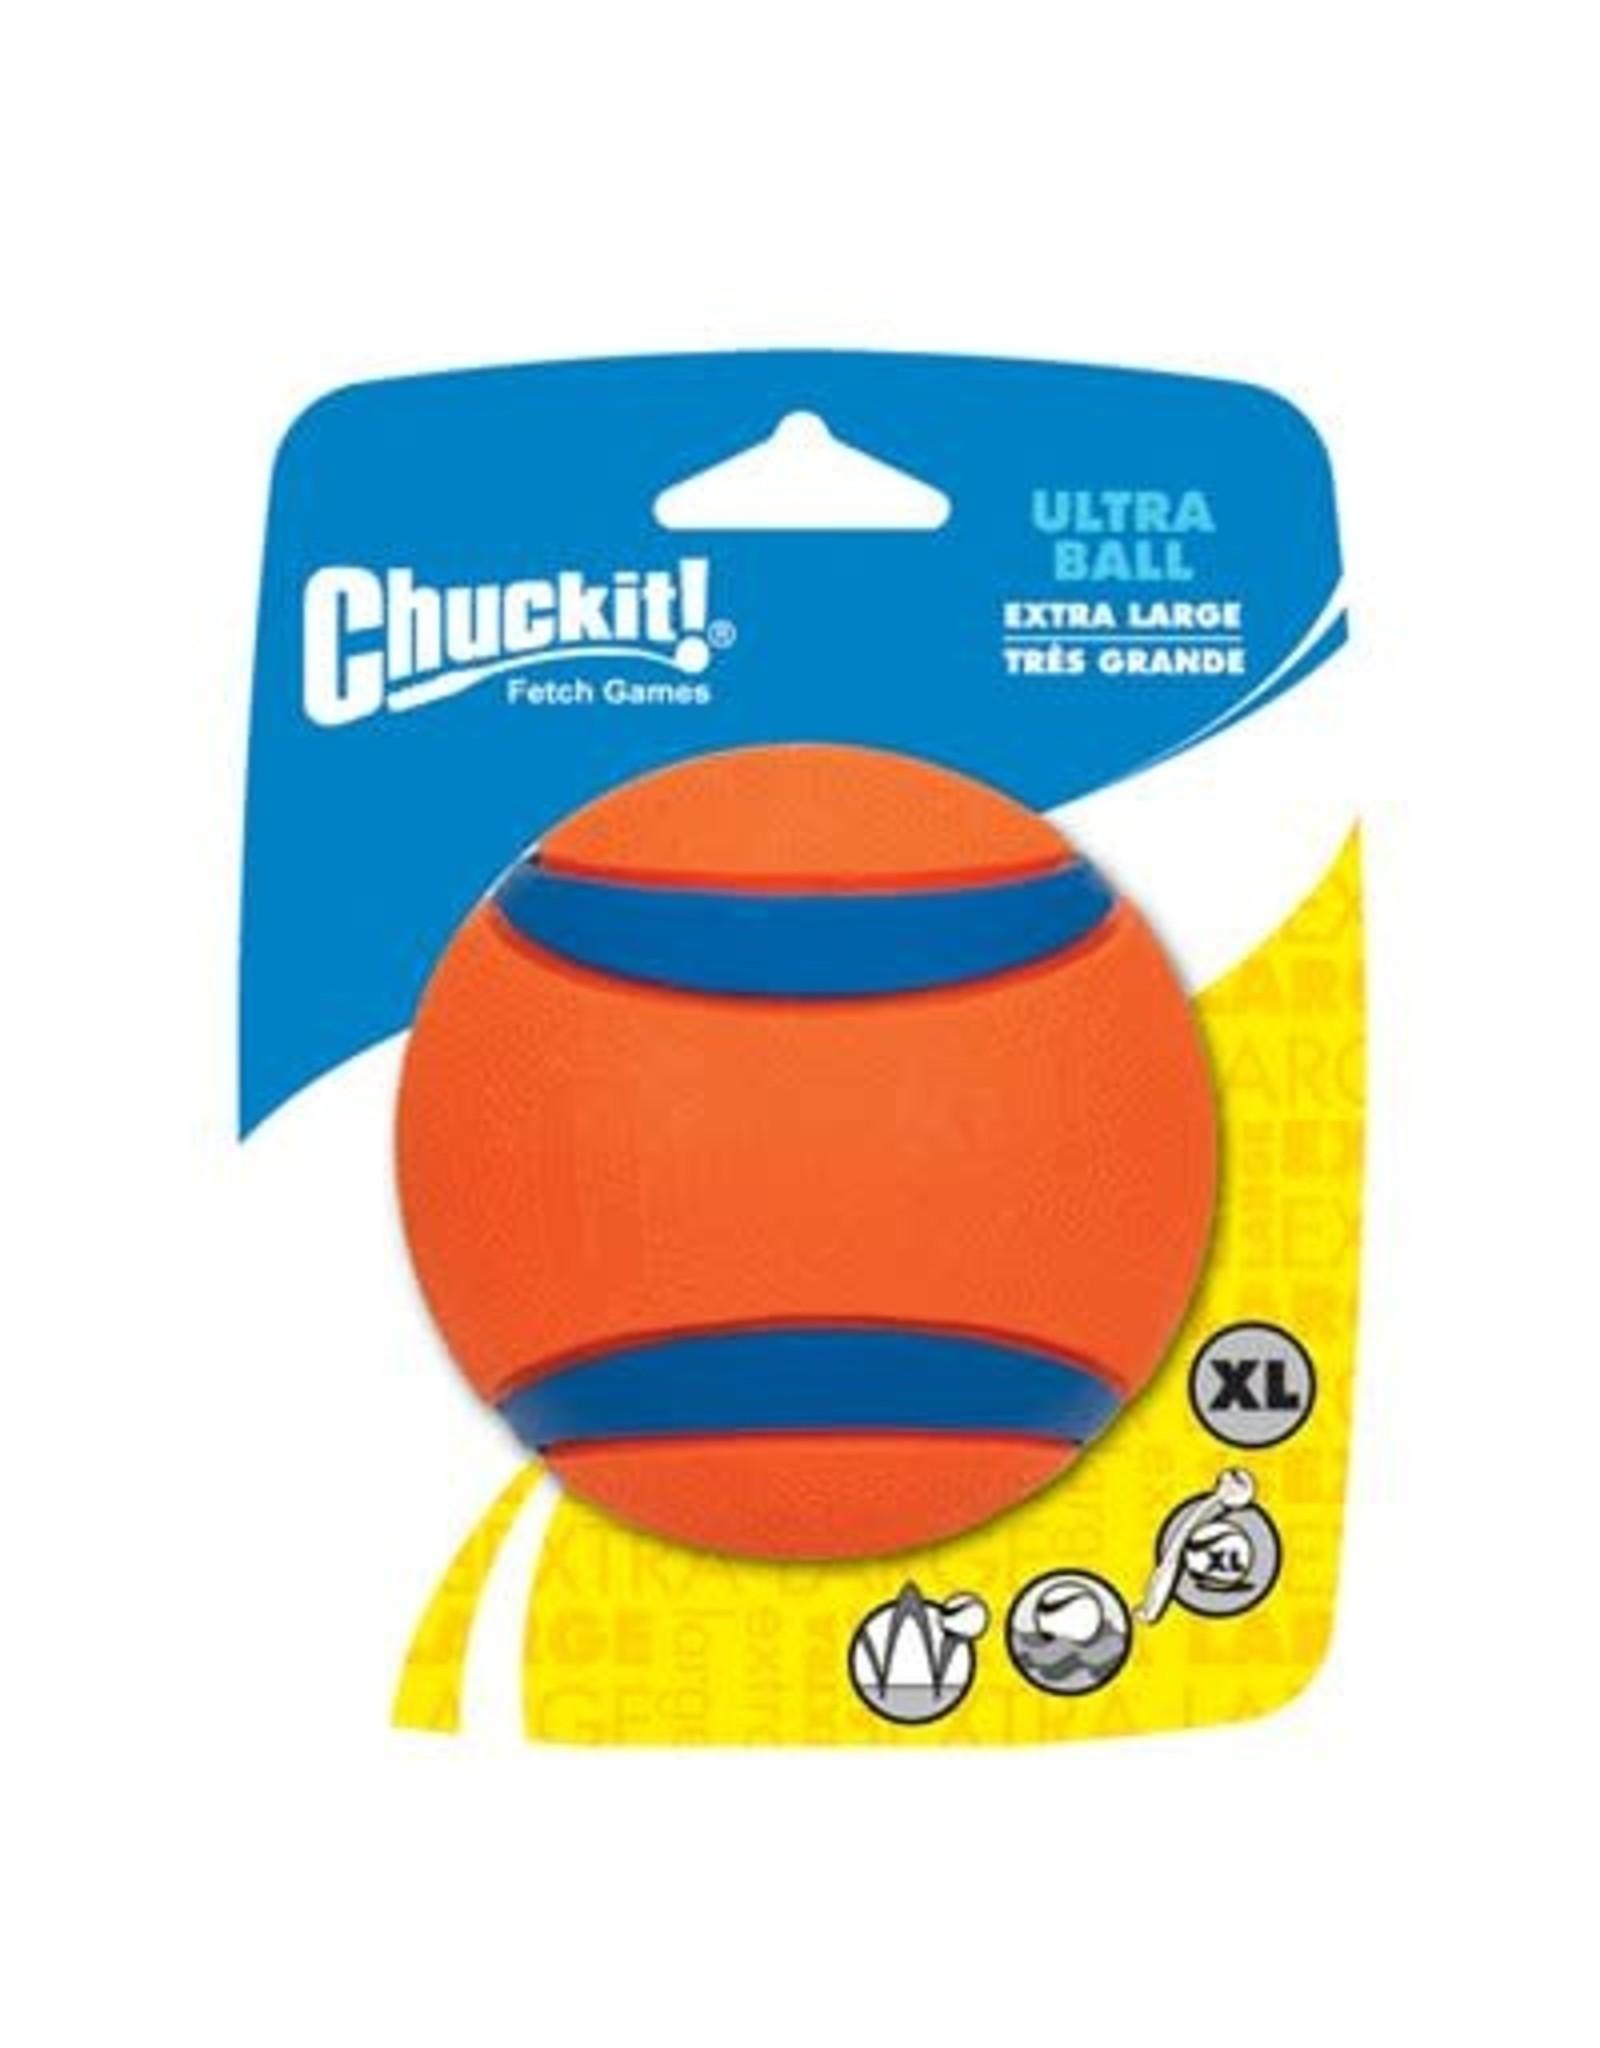 Chuck-It Chuck-It Ultra Ball XL